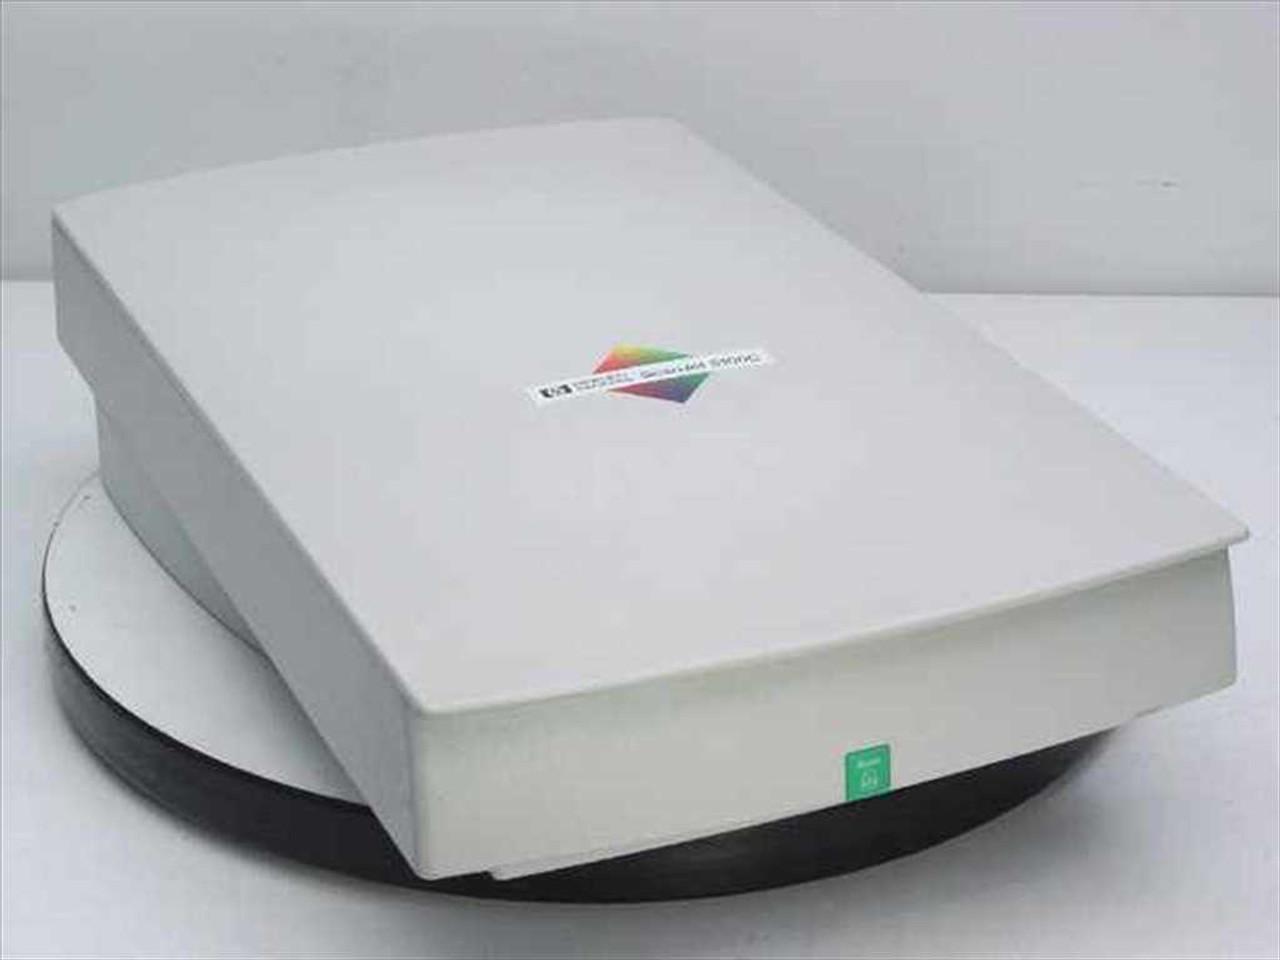 HP SCANJET 5100C TREIBER WINDOWS 7